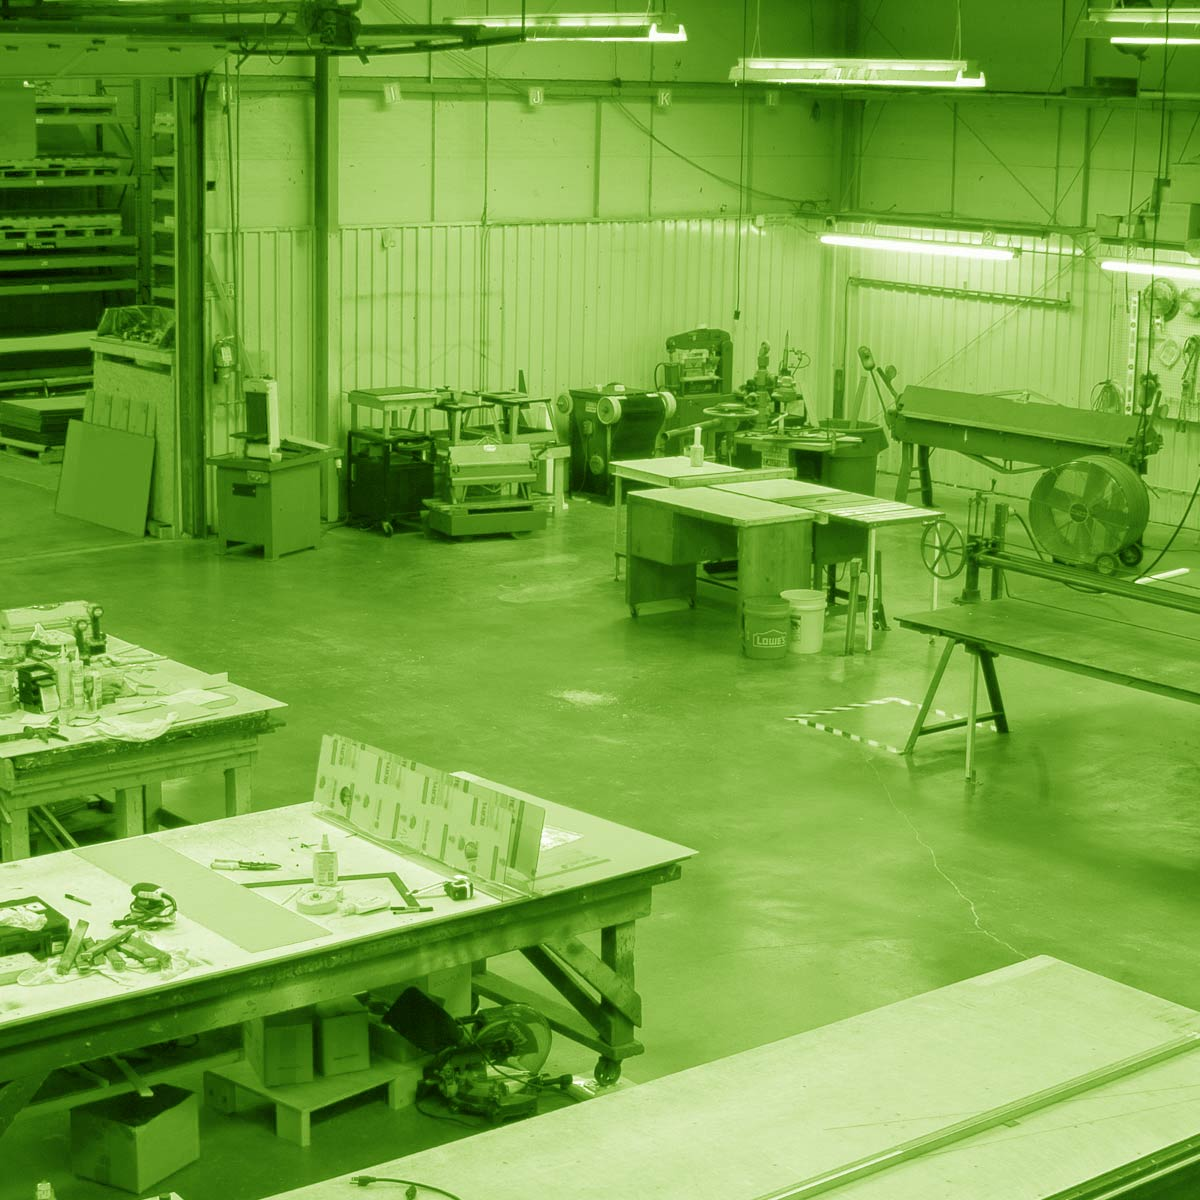 Lustercraft Plastics, Wichita Kansas Plastic Product Manufacturer